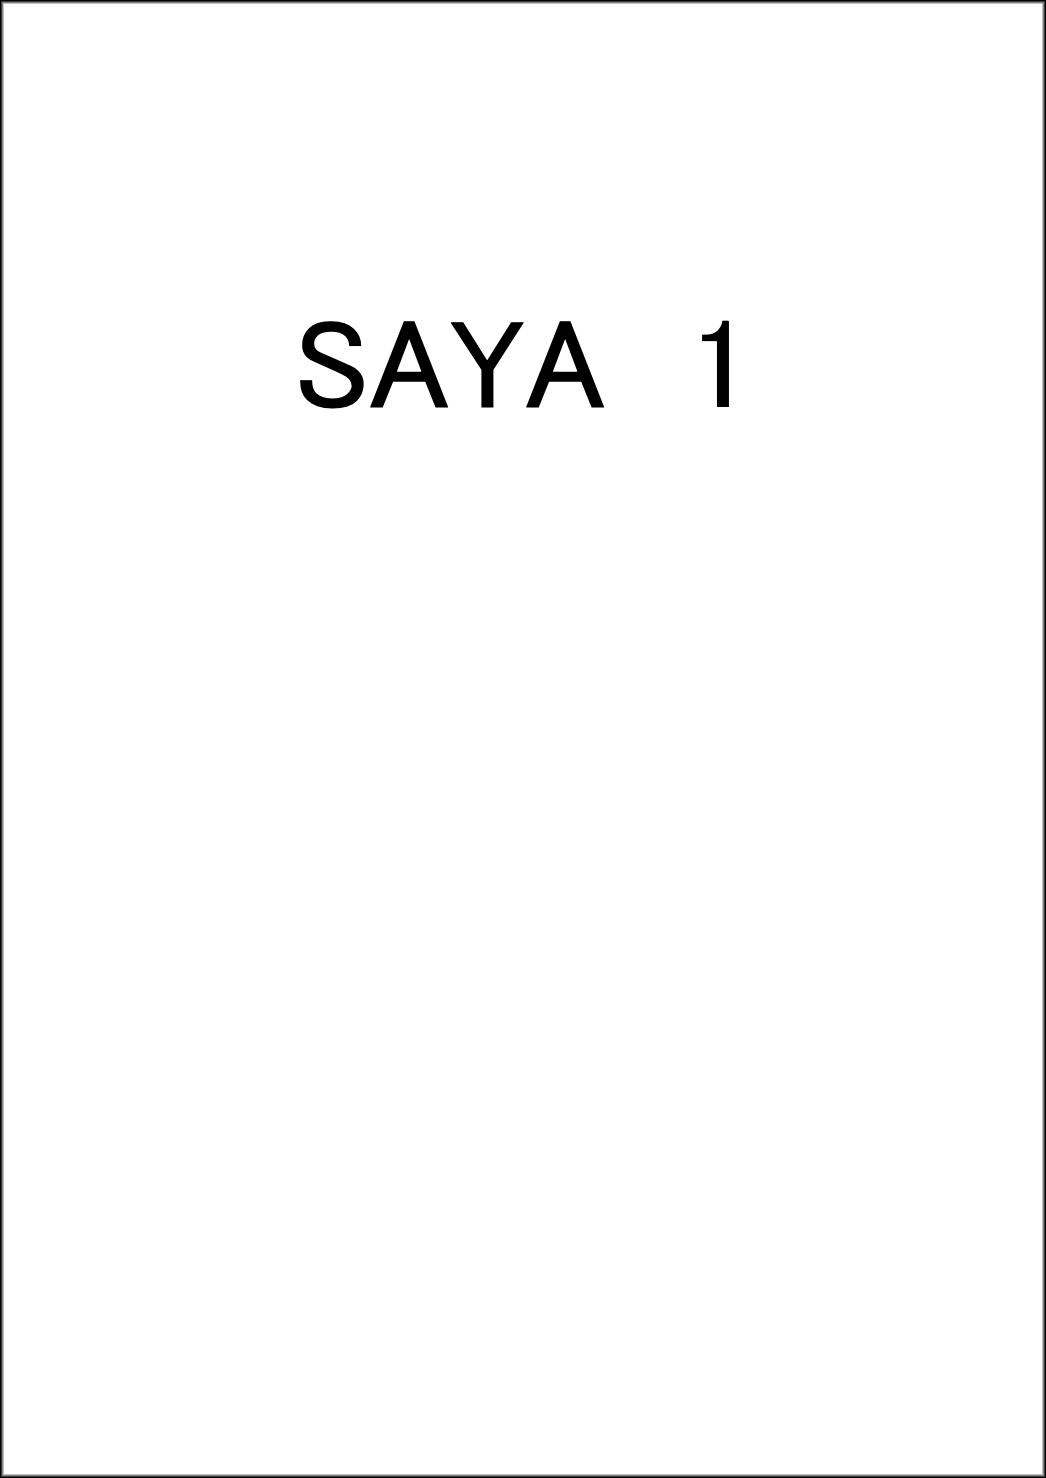 C31621643